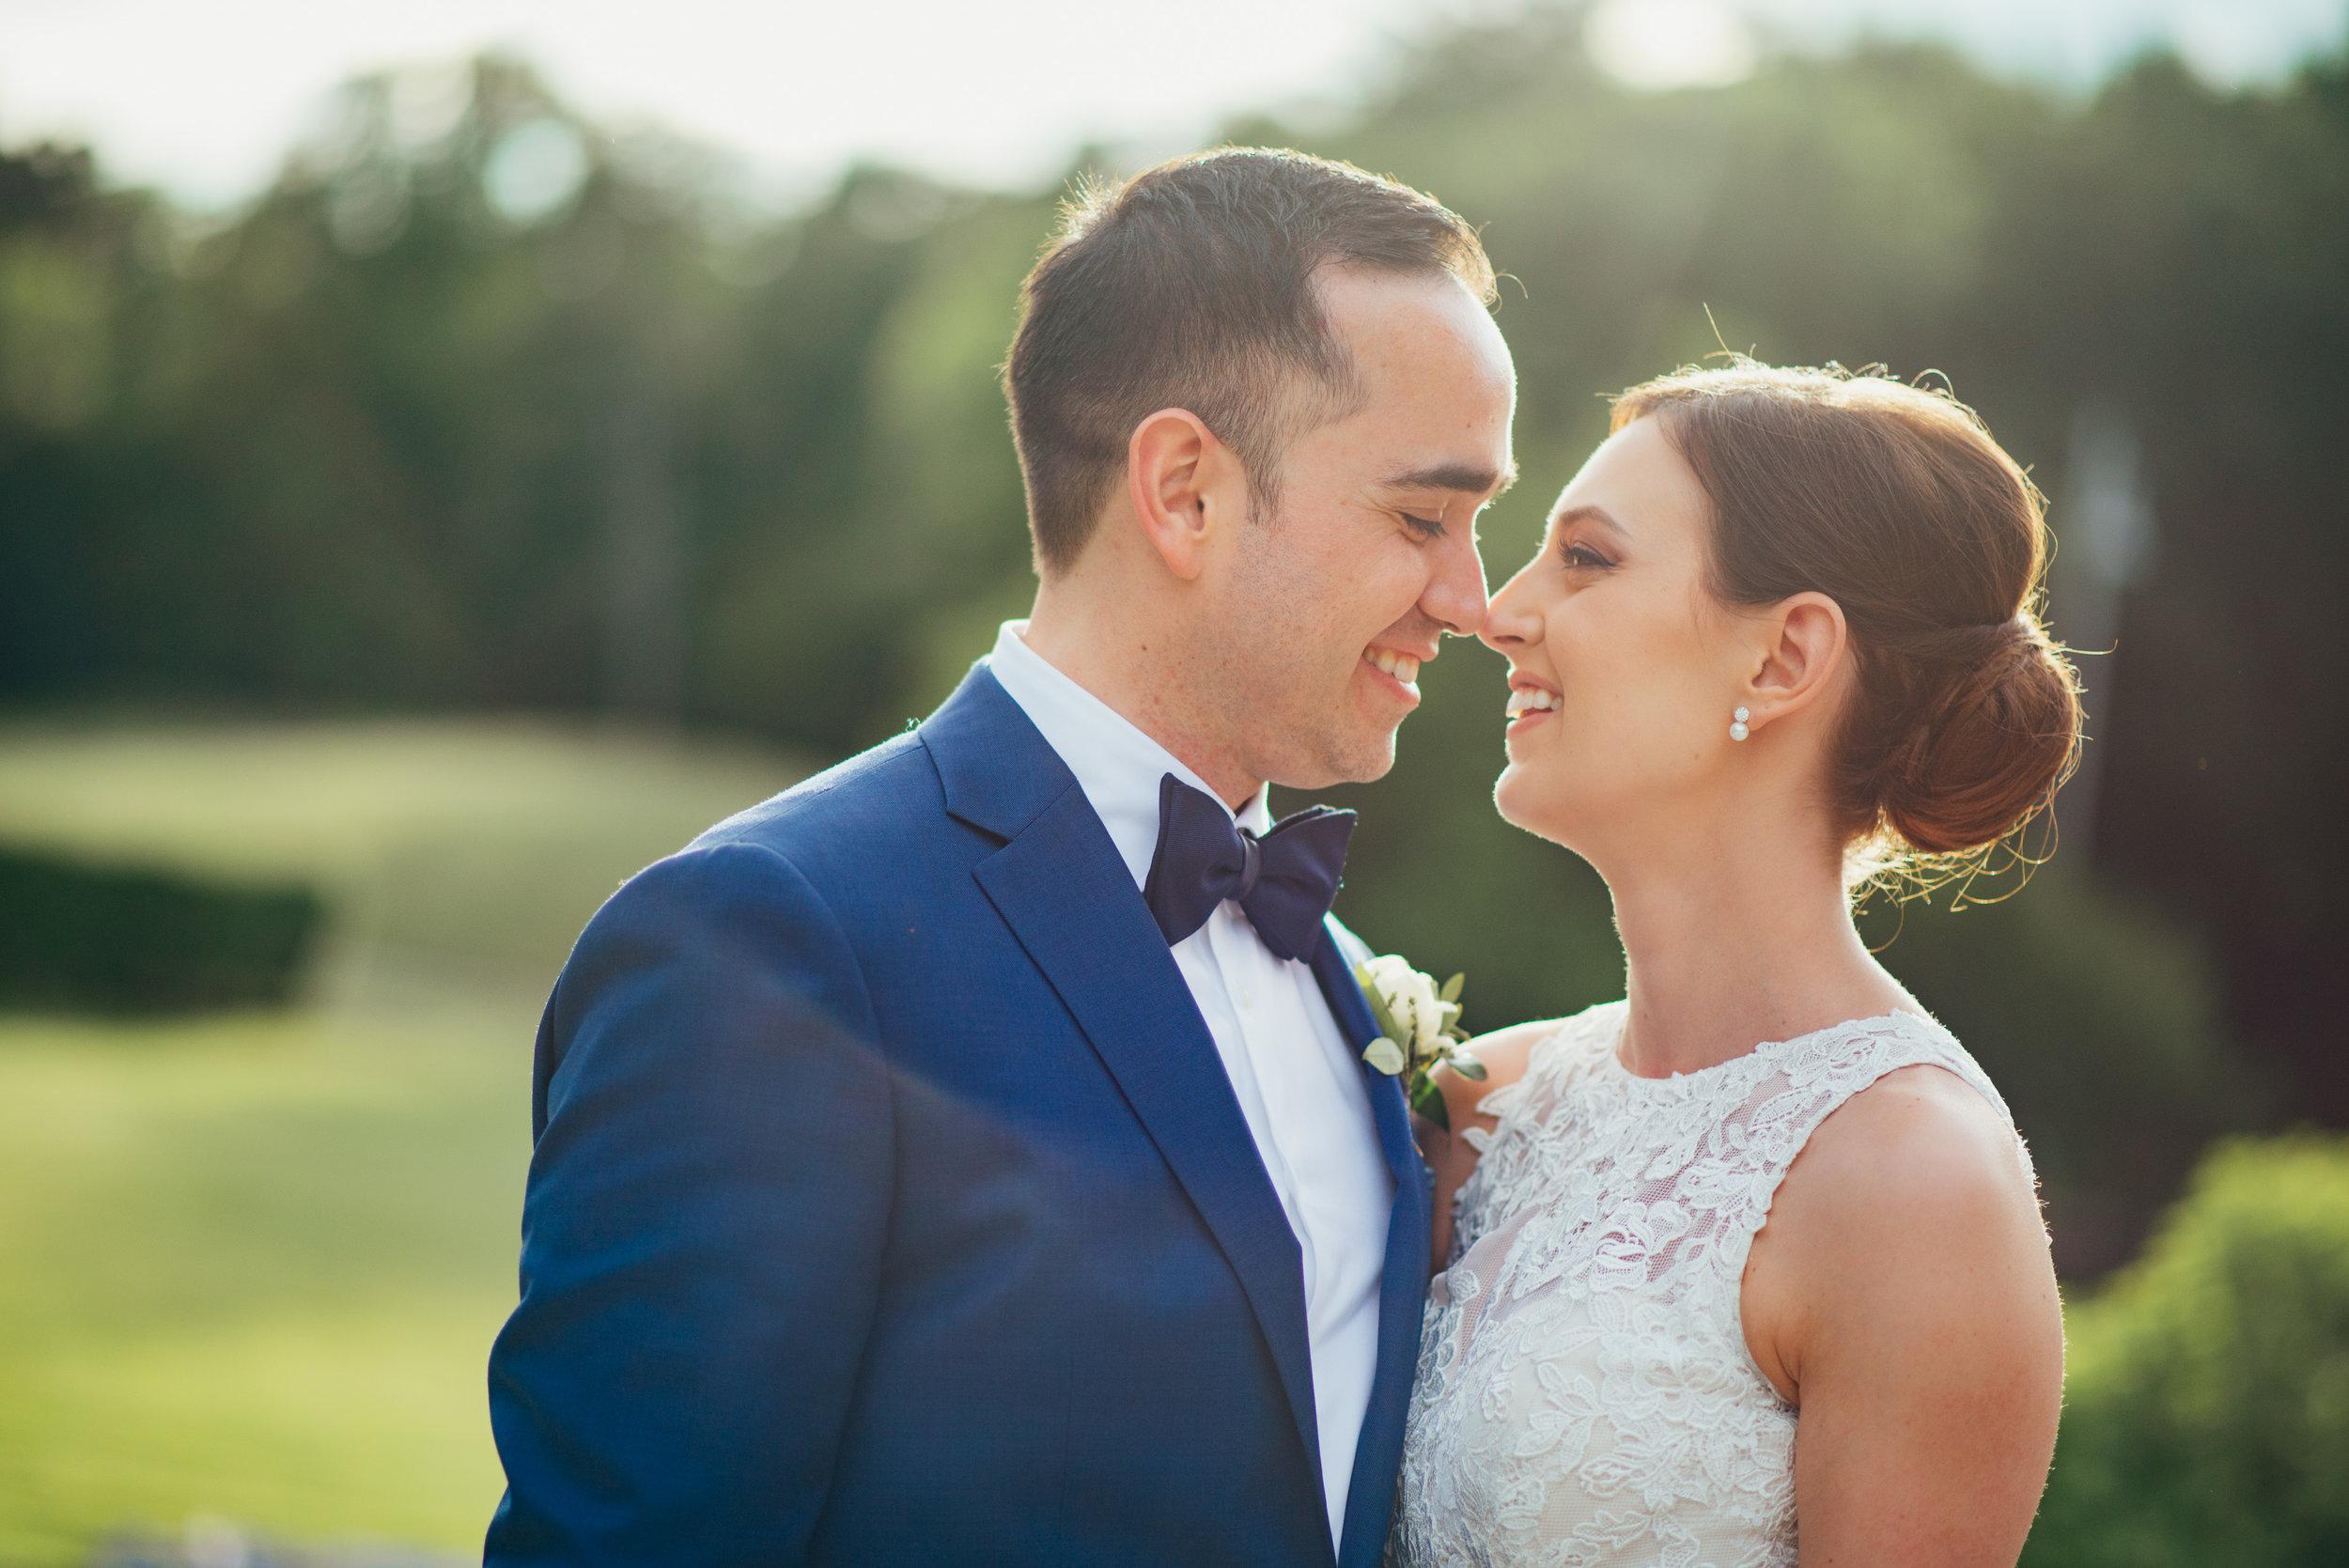 cleland-studios-wedding-photography-48.jpg